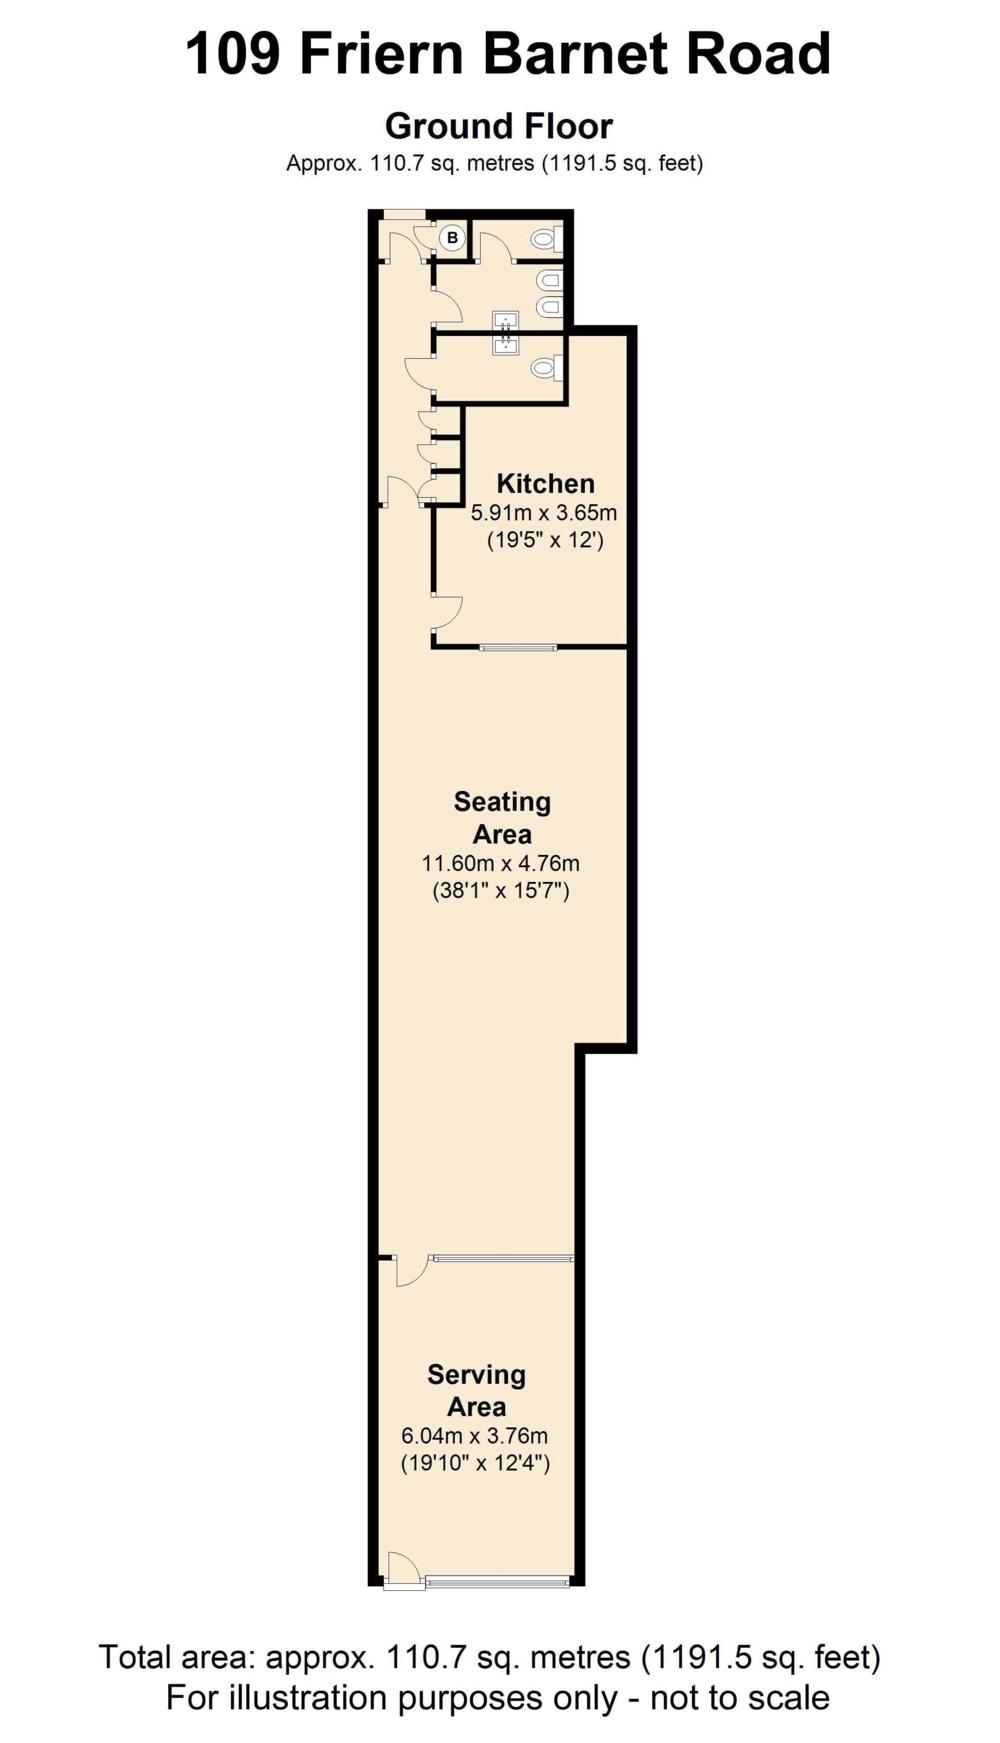 109 Friern Barnet Rd - Floorplan.png